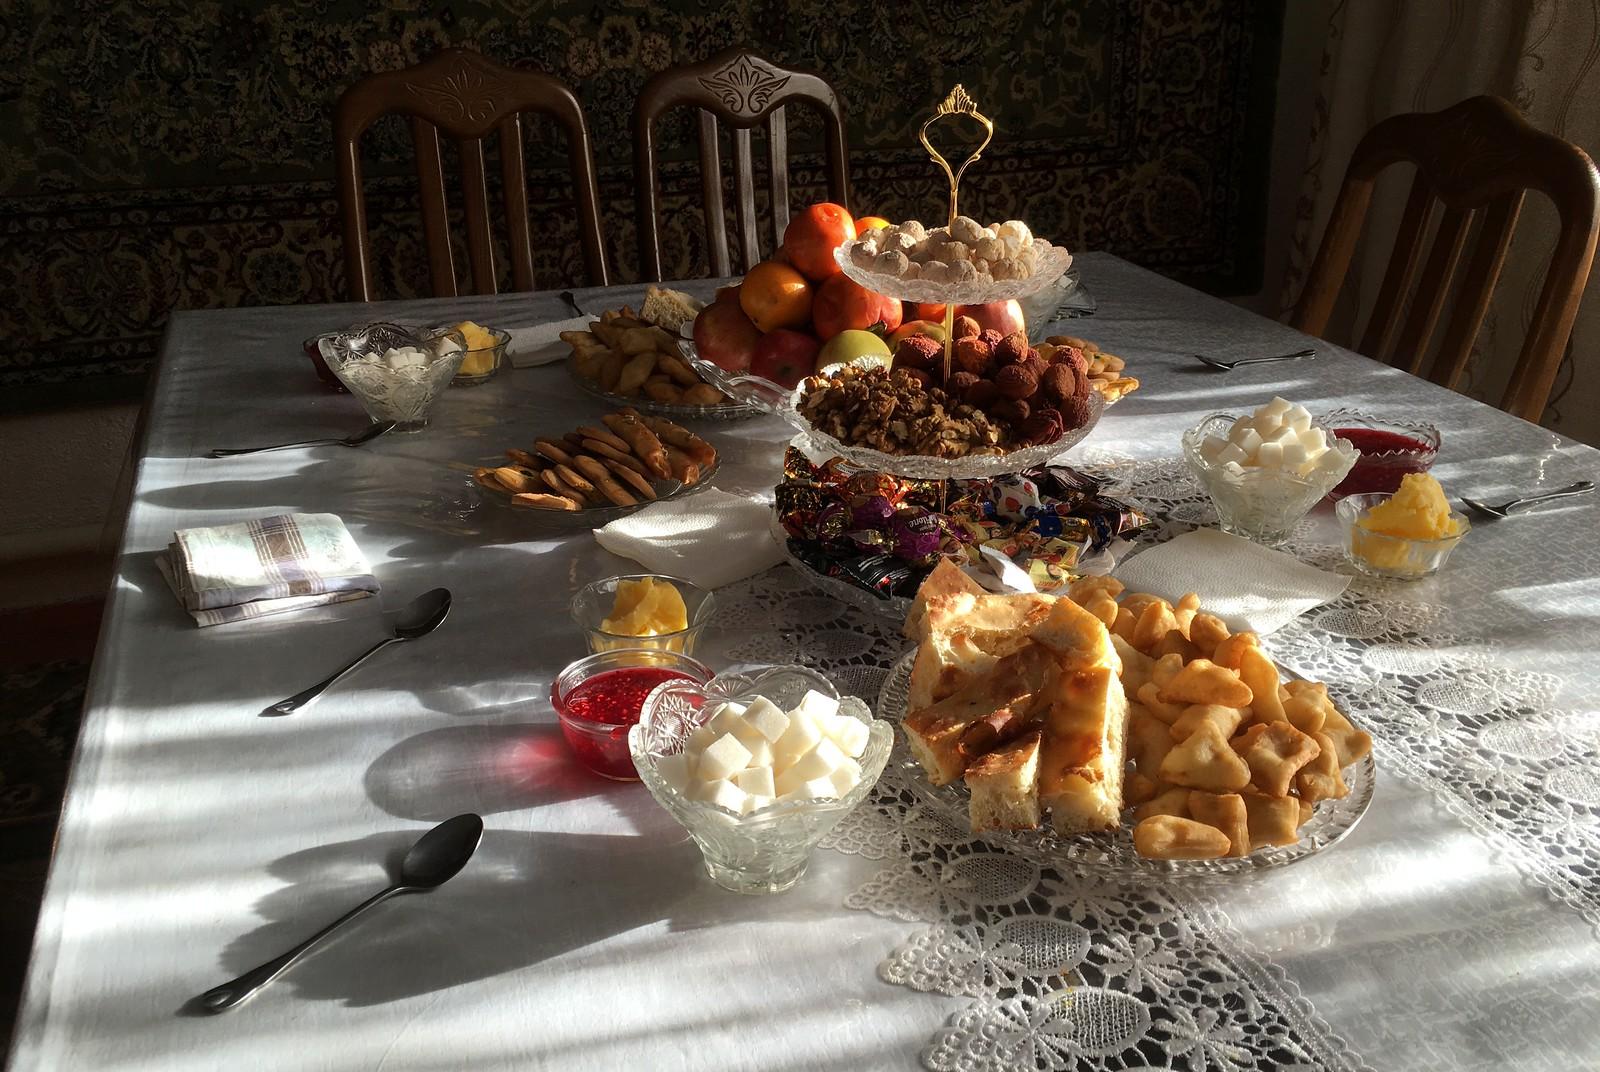 Tea Time in Kyrgyzstan - Kyzyl-Tuu, Southern Shore